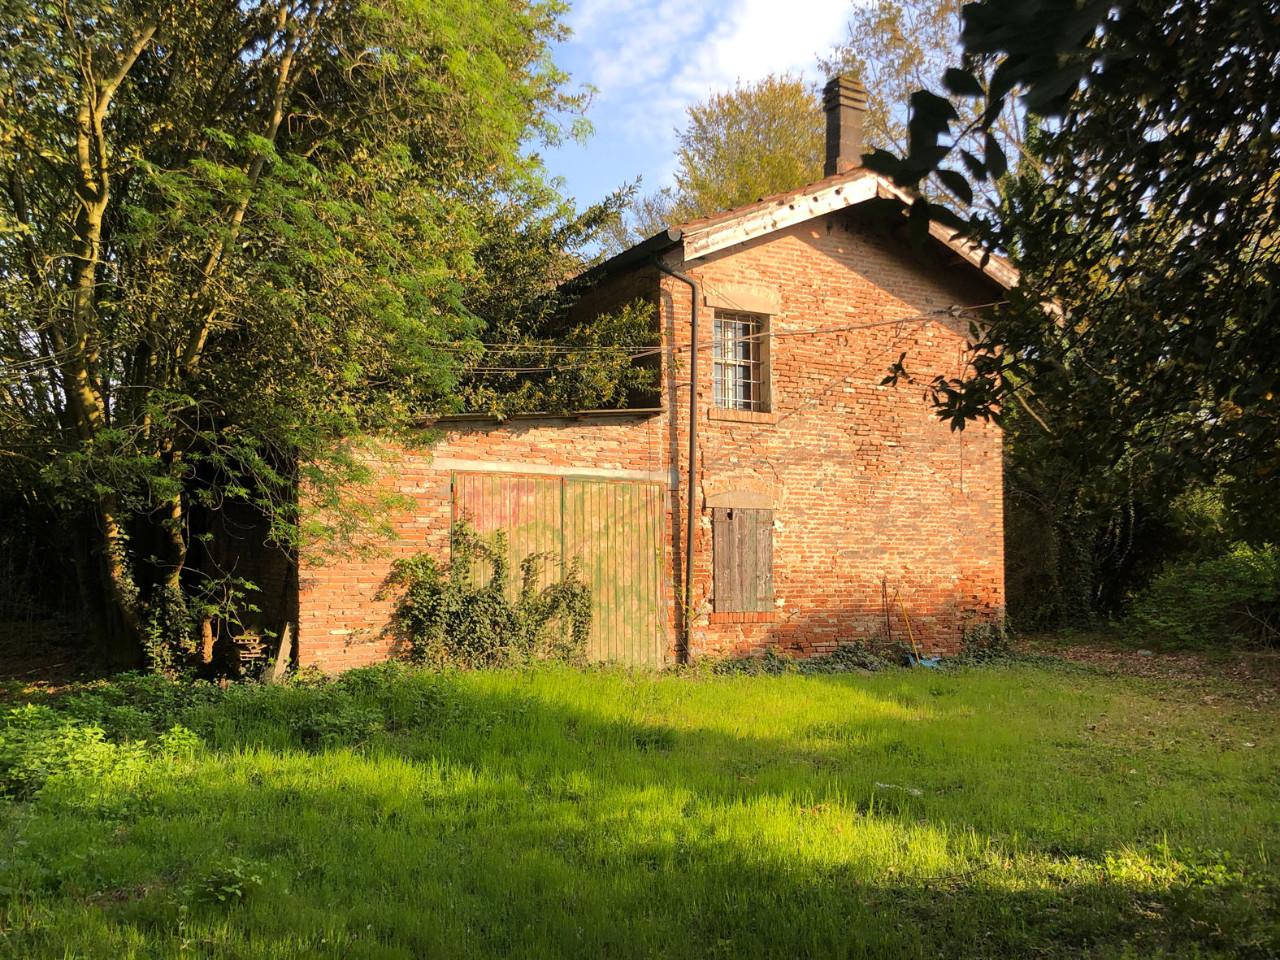 Rustico in vendita Ferrara Zona Quartesana